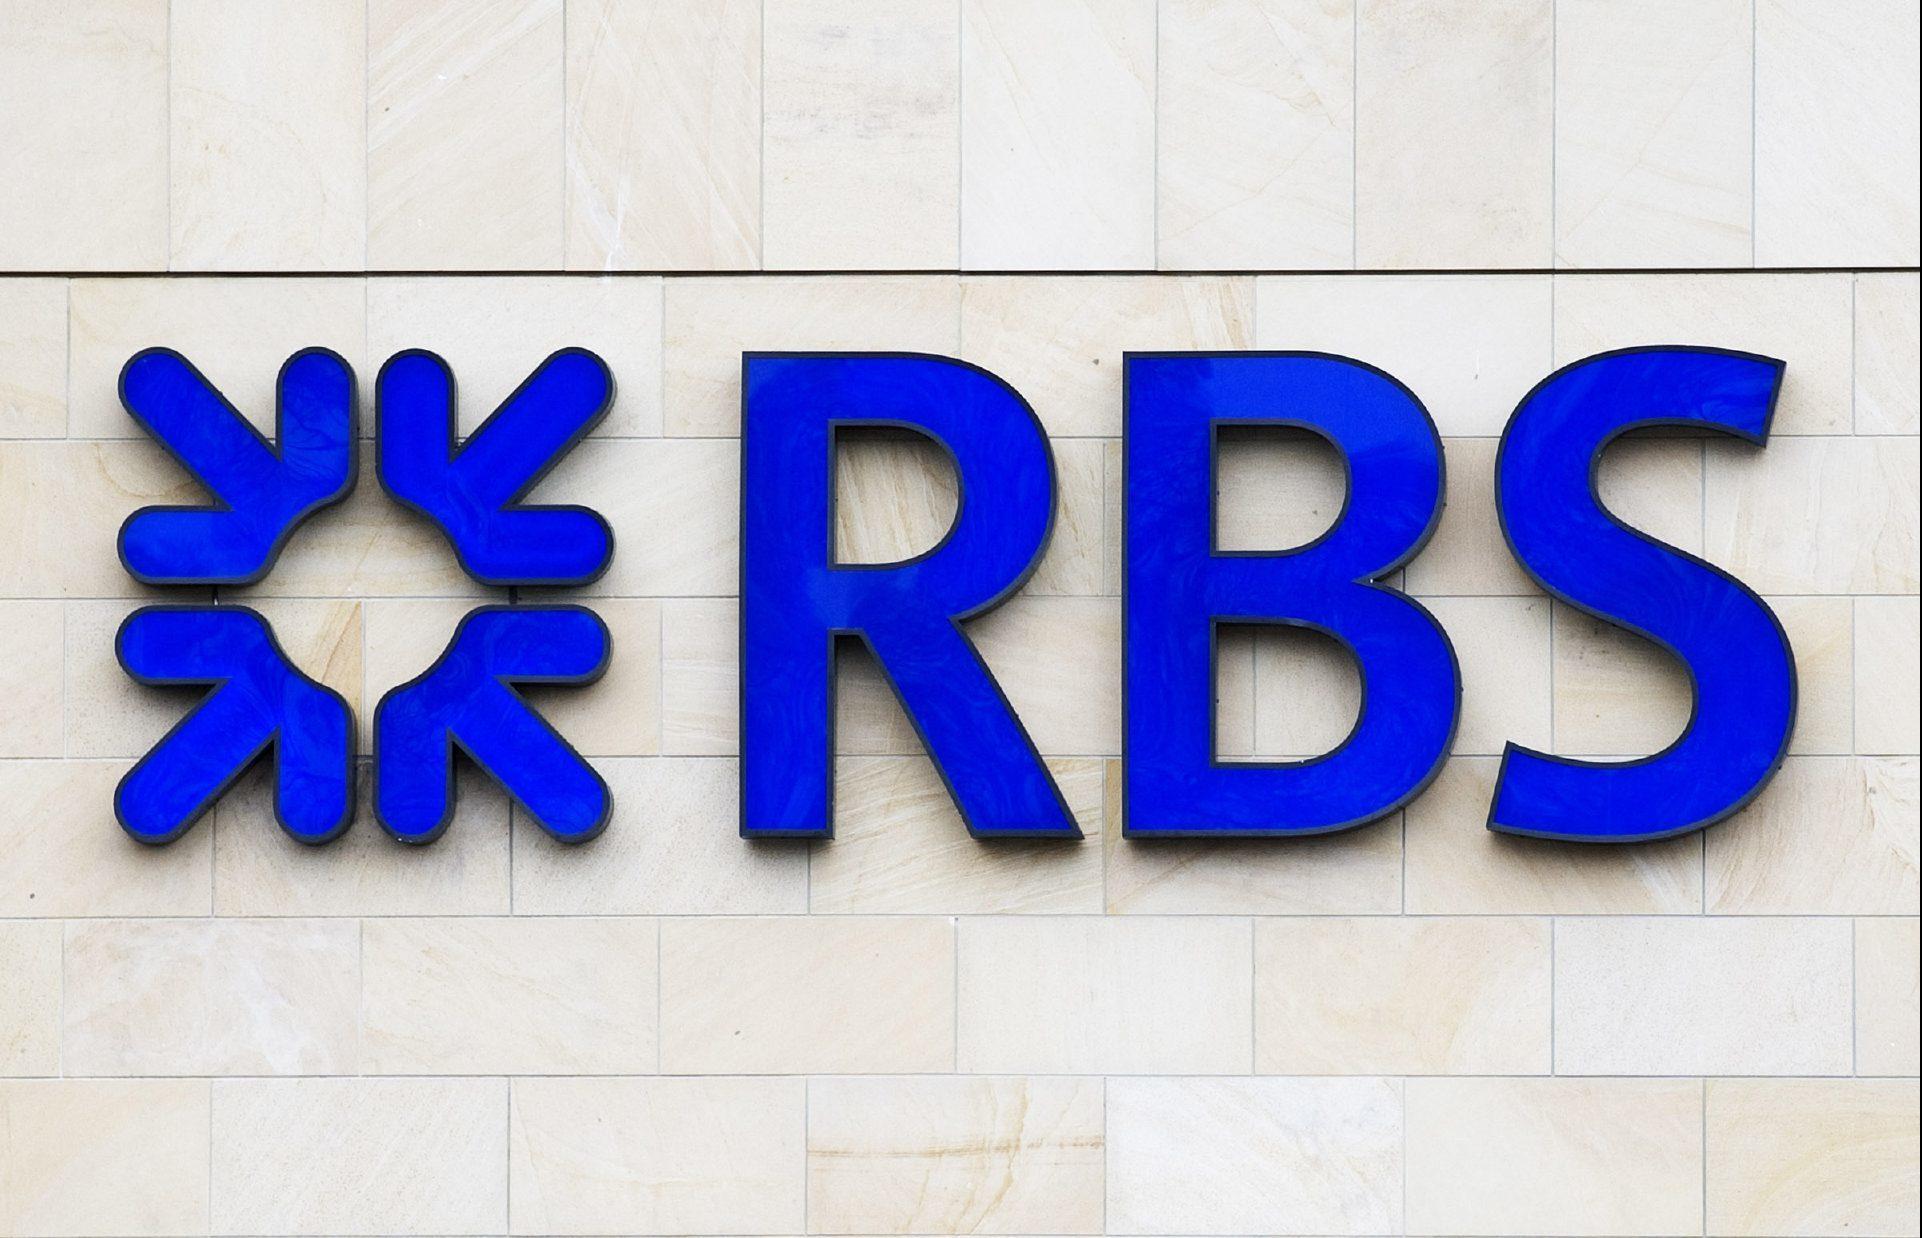 RBS is looking to cut 200 jobs.